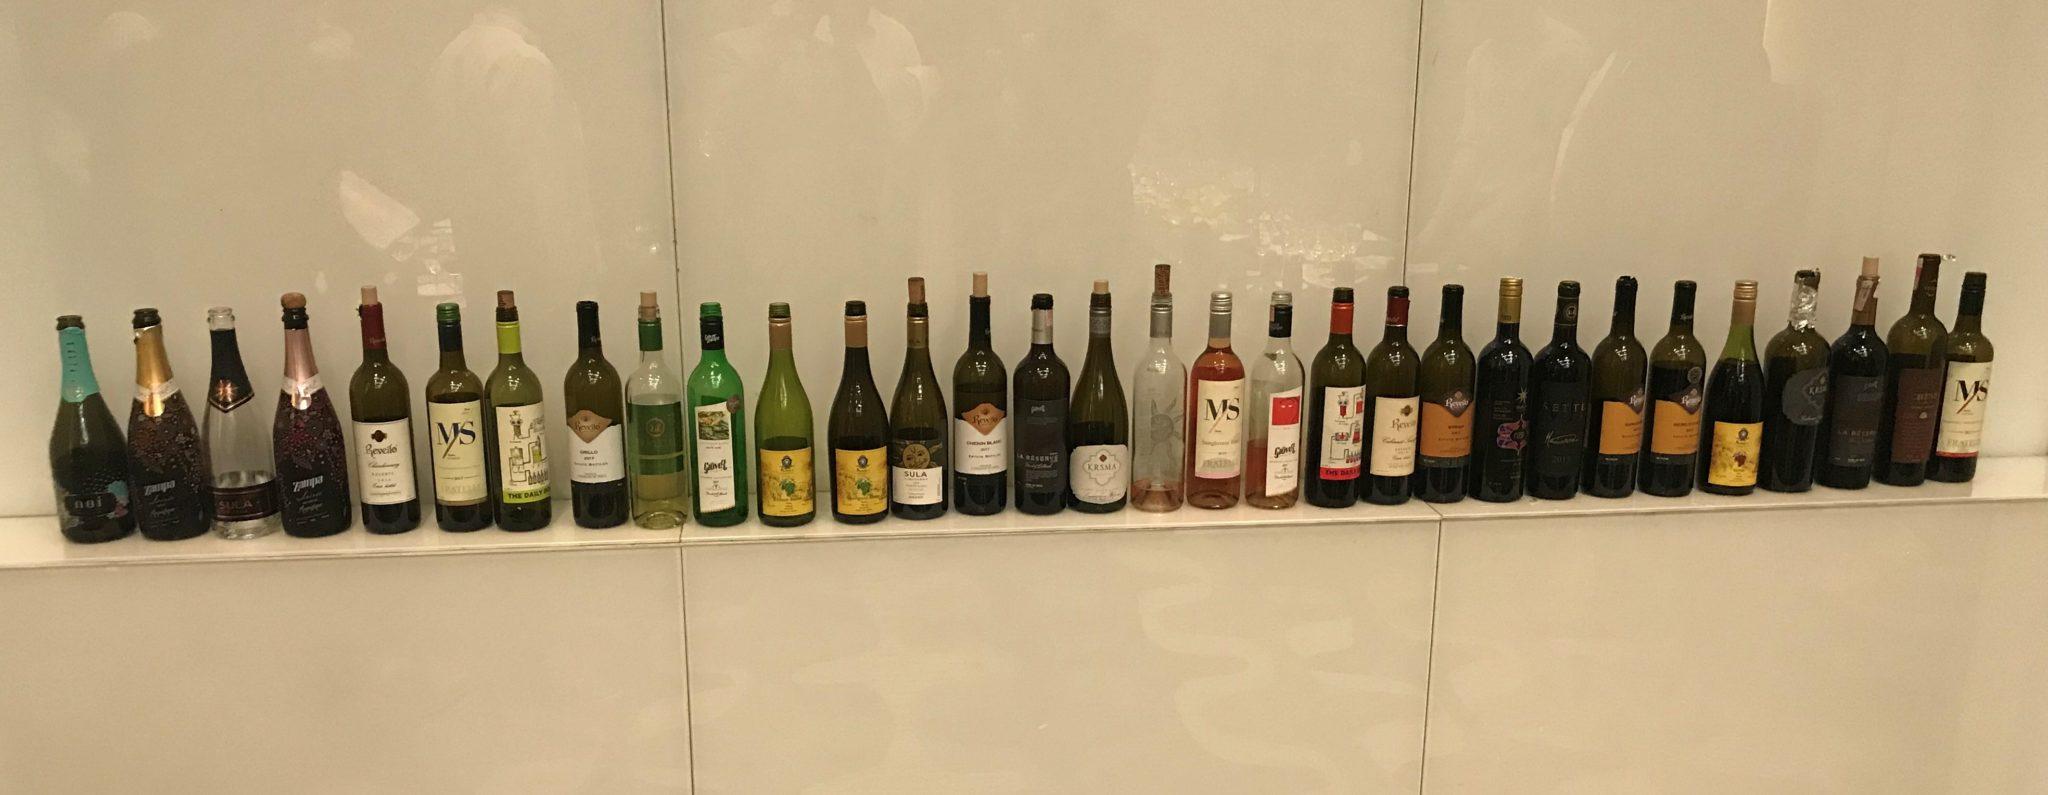 spiritz-2018-wine-lineup